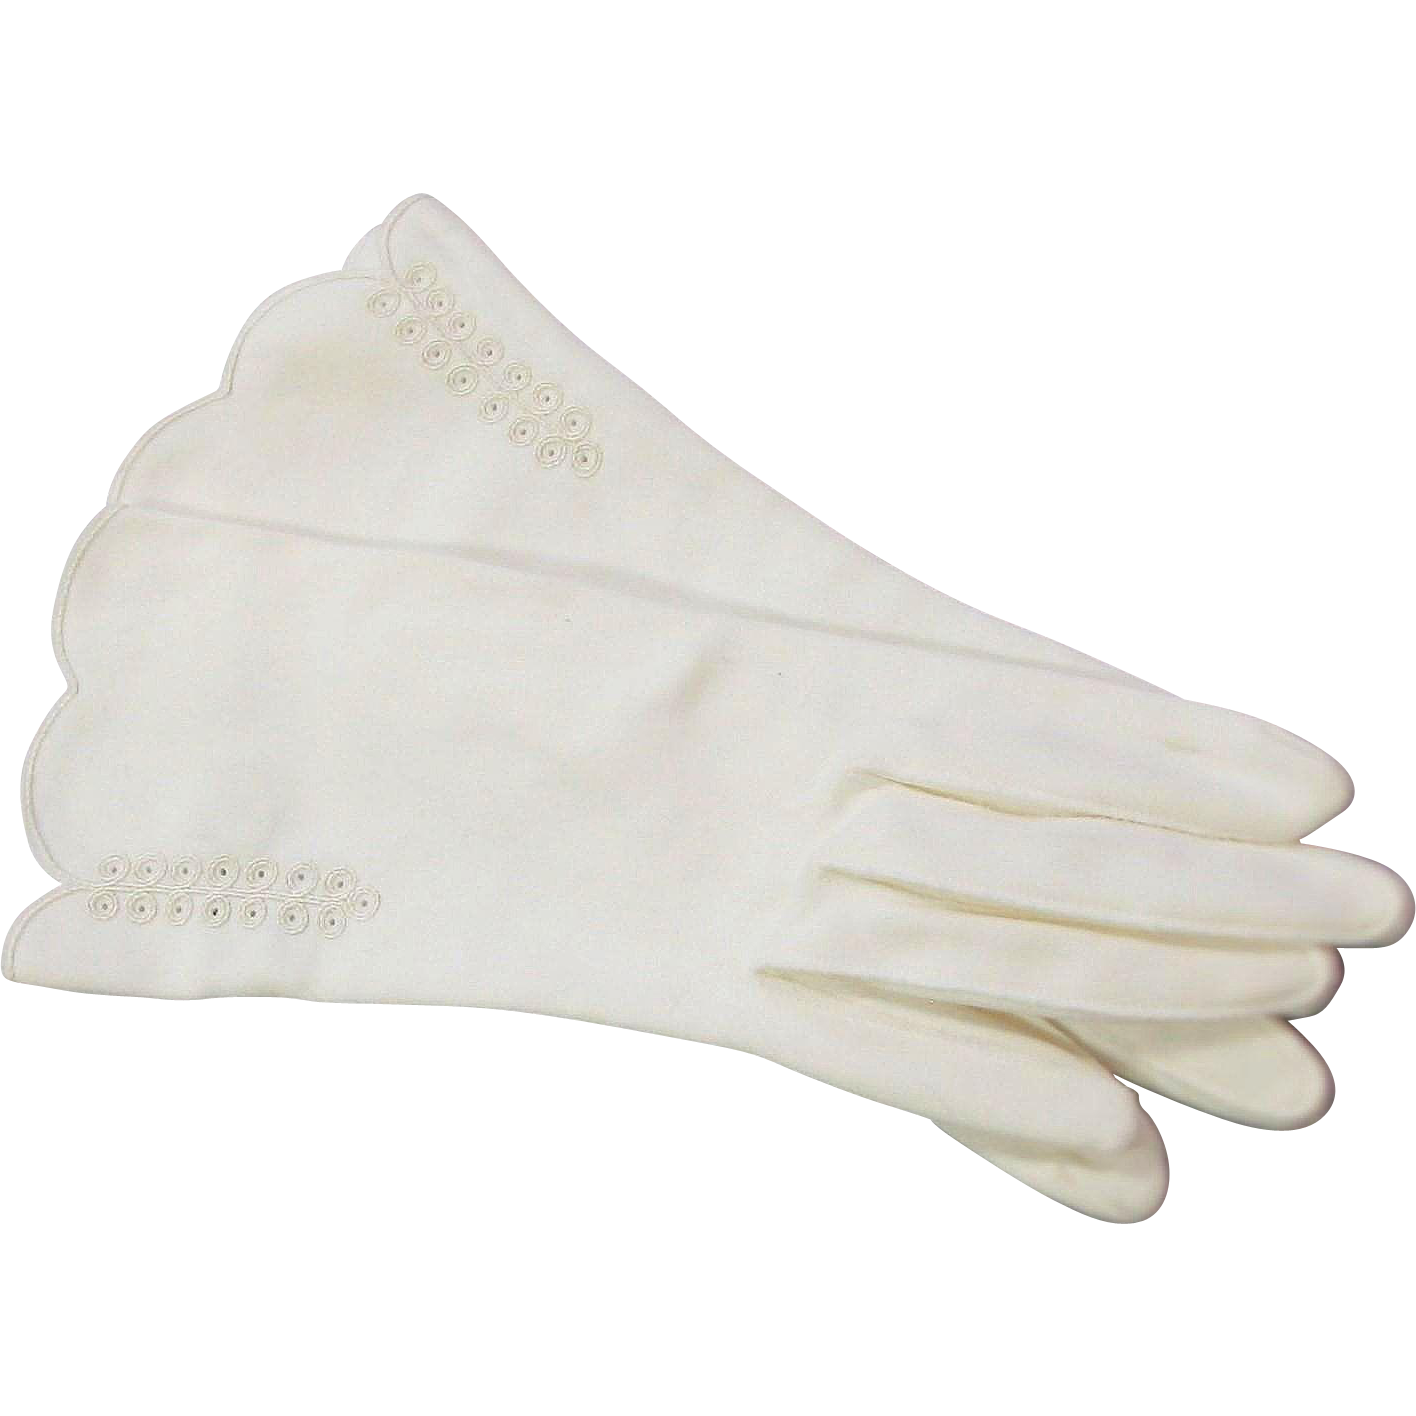 Vintage Cotton Gloves 113